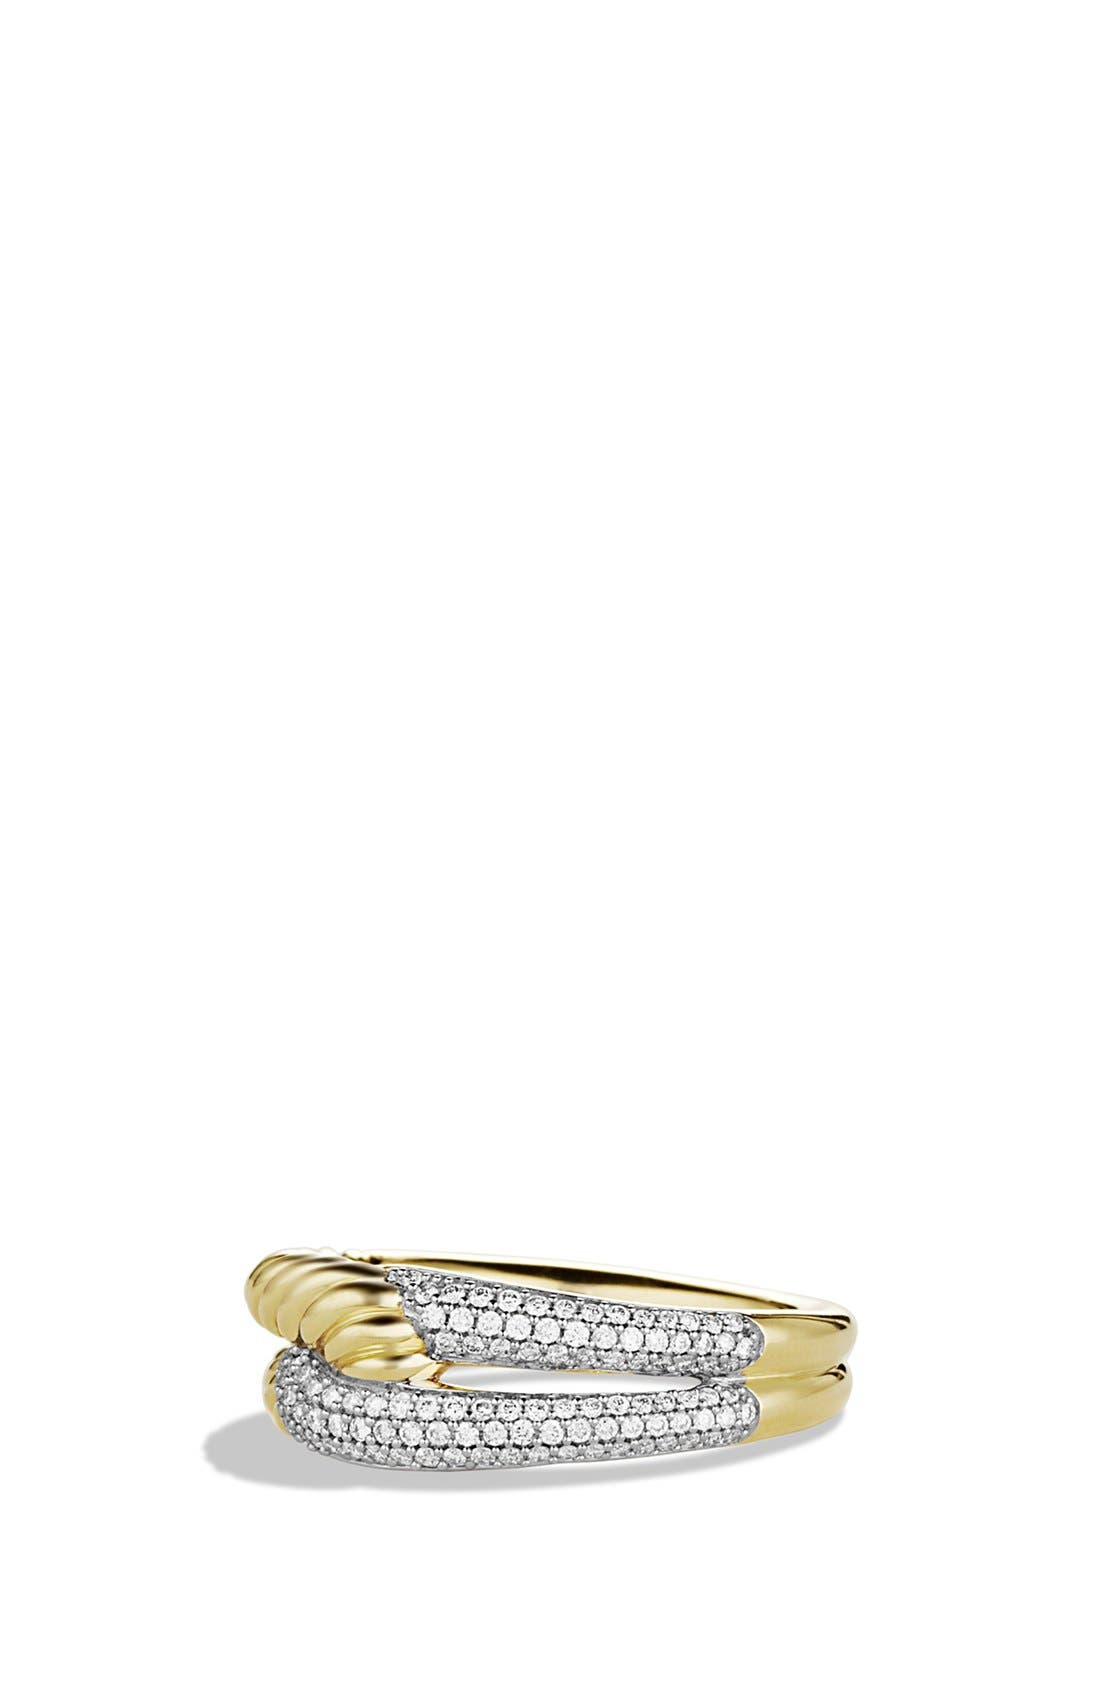 David Yurman 'Labyrinth' Single Loop Ring with Diamonds in Gold